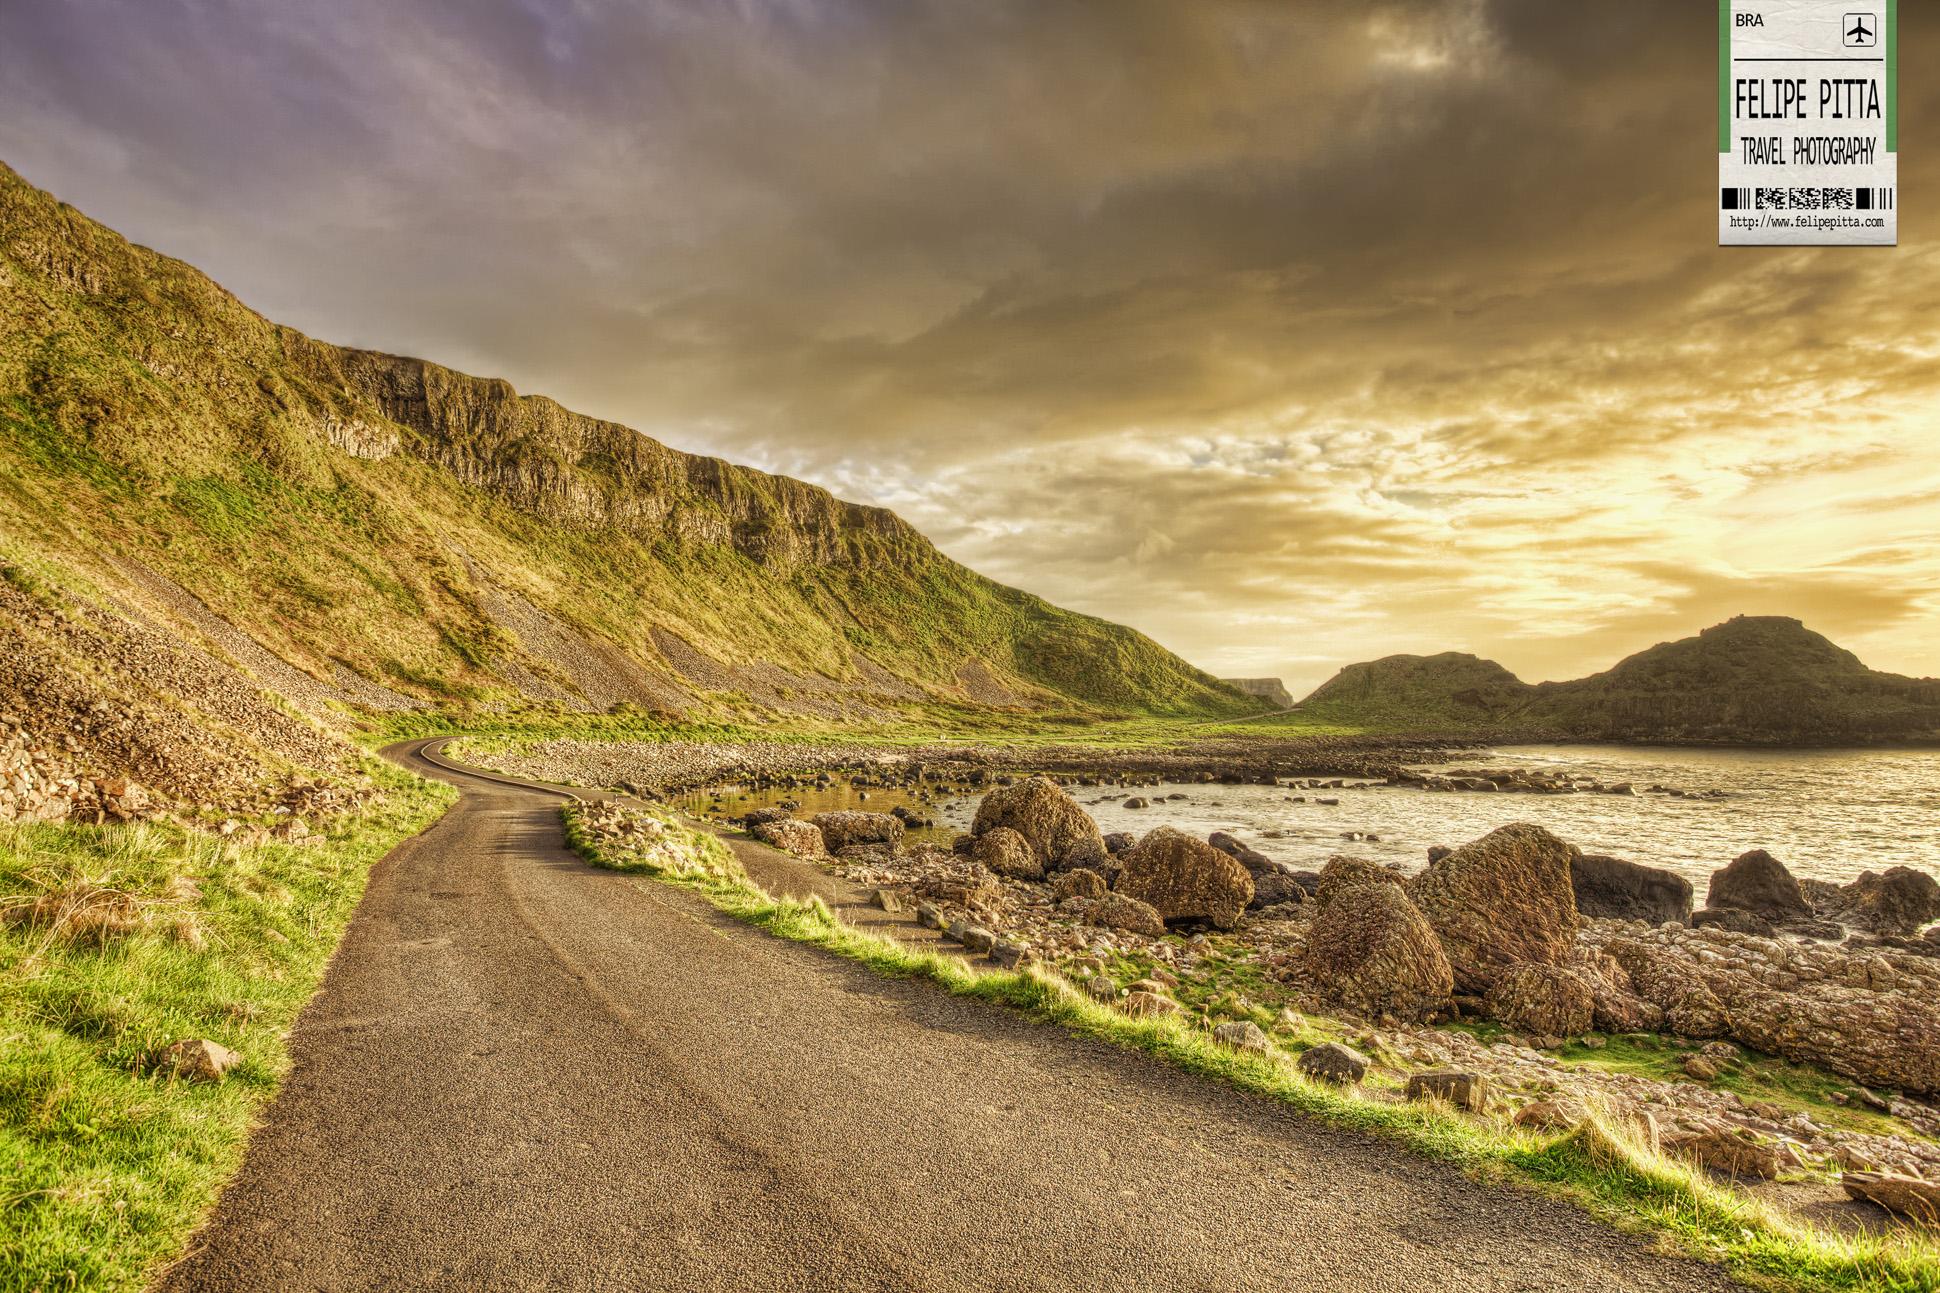 Giants Causeway Road in Northern Ireland